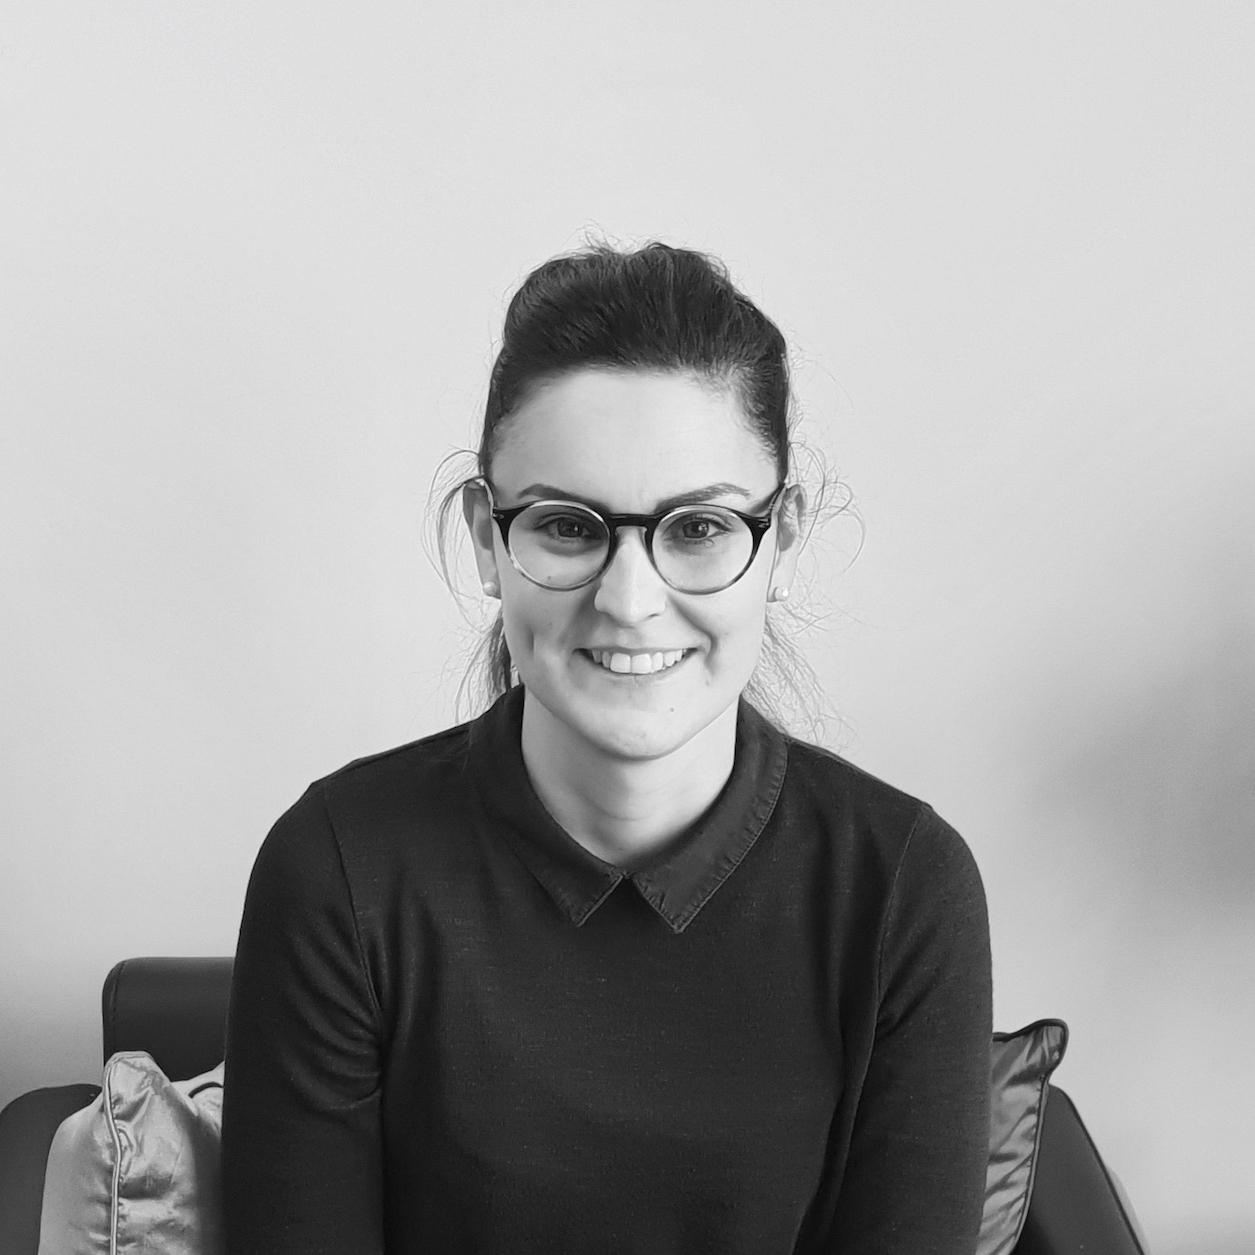 Julie Devoisselle